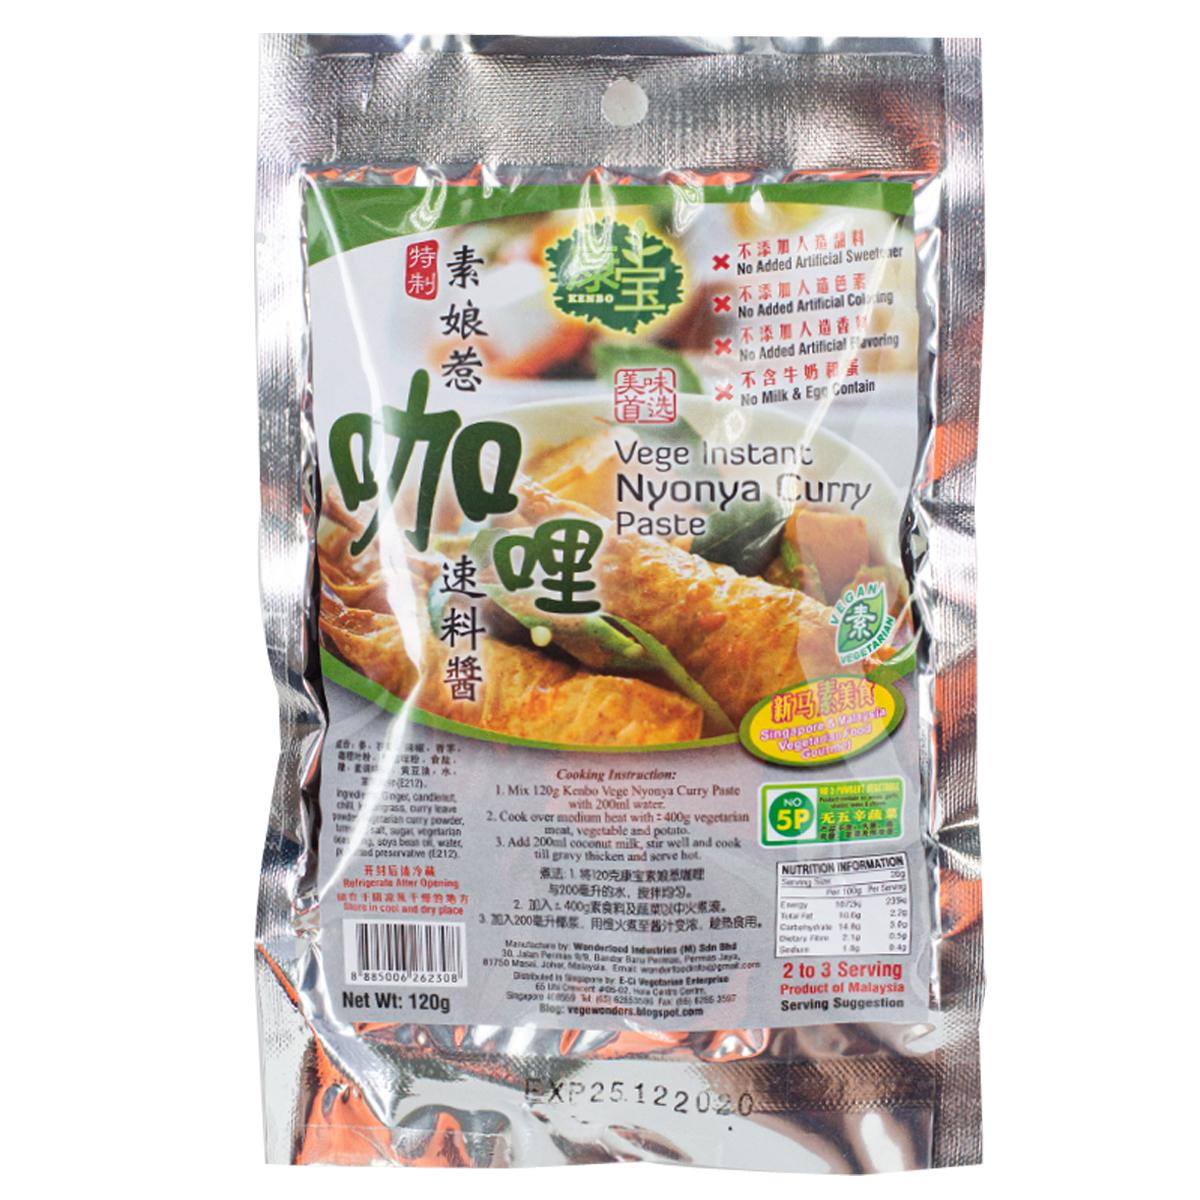 Image Nyonya Curry Paste 康宝-娘惹咖喱速料酱 120 grams